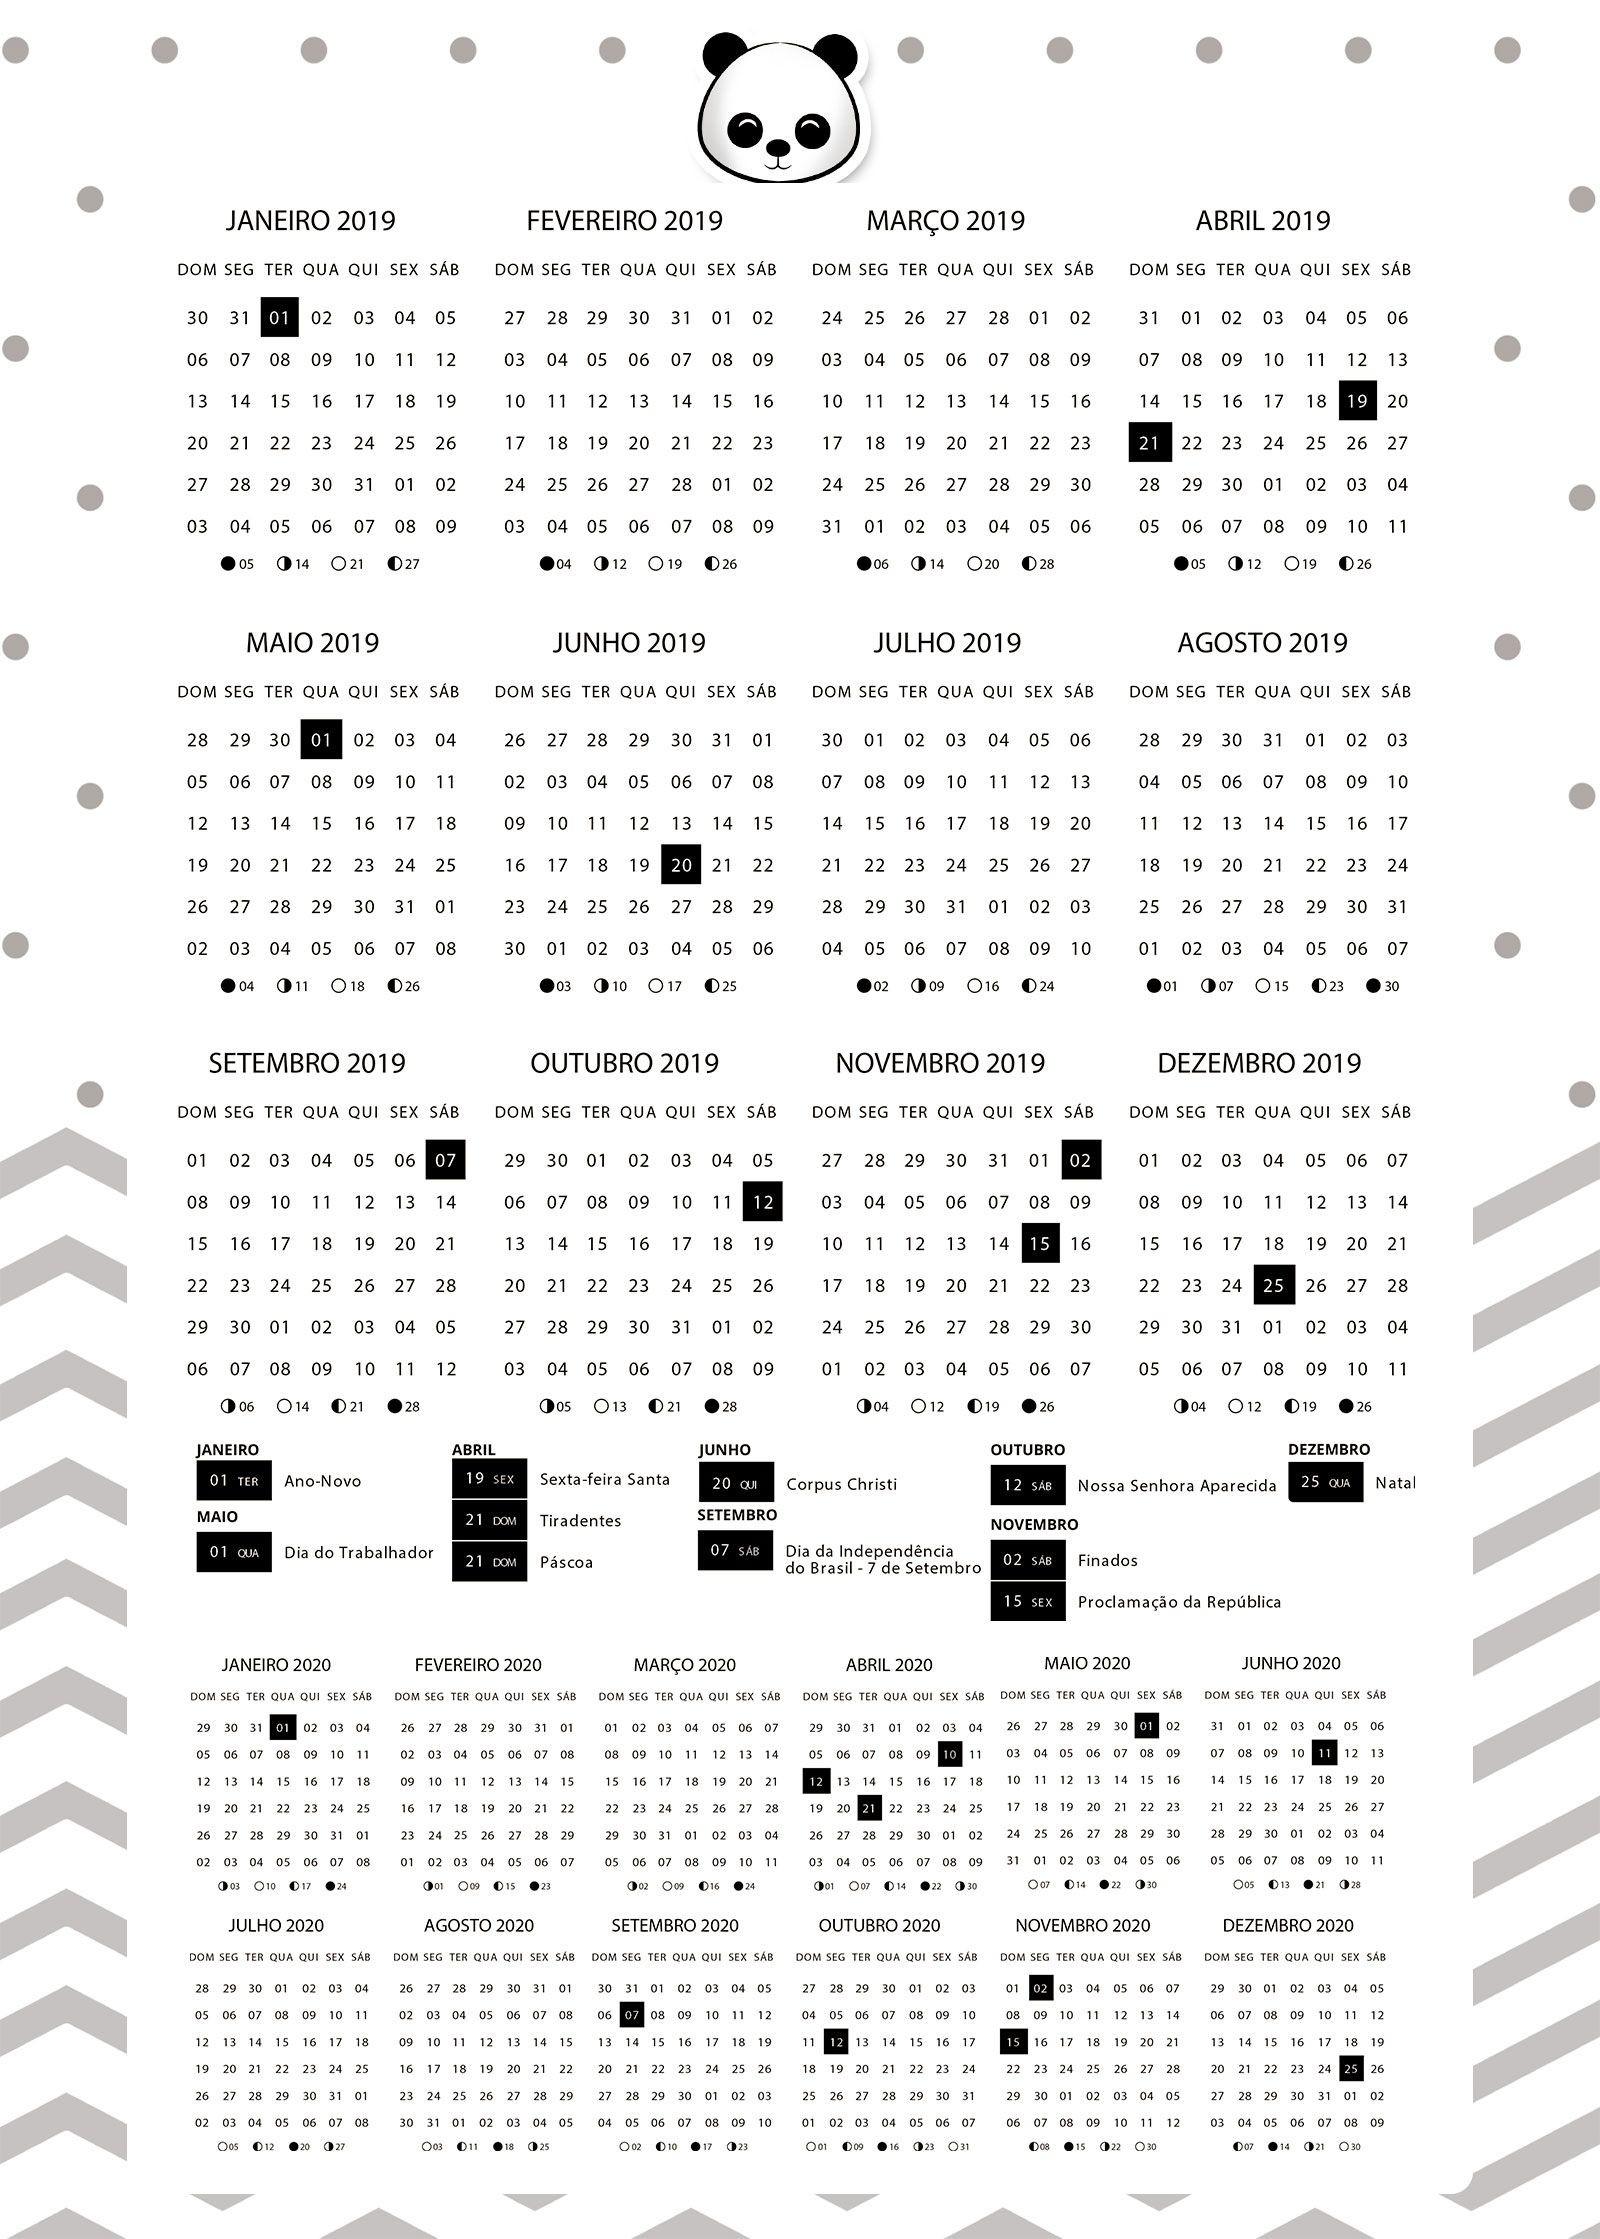 Calendario 2019 Feriados Para Imprimir Más Recientes Planner 2019 Panda Menino Calendario 2019 E 2020 Of Calendario 2019 Feriados Para Imprimir Mejores Y Más Novedosos Barevné Plánovač 2019 července Odděleně — Stock Vektor © Nastya